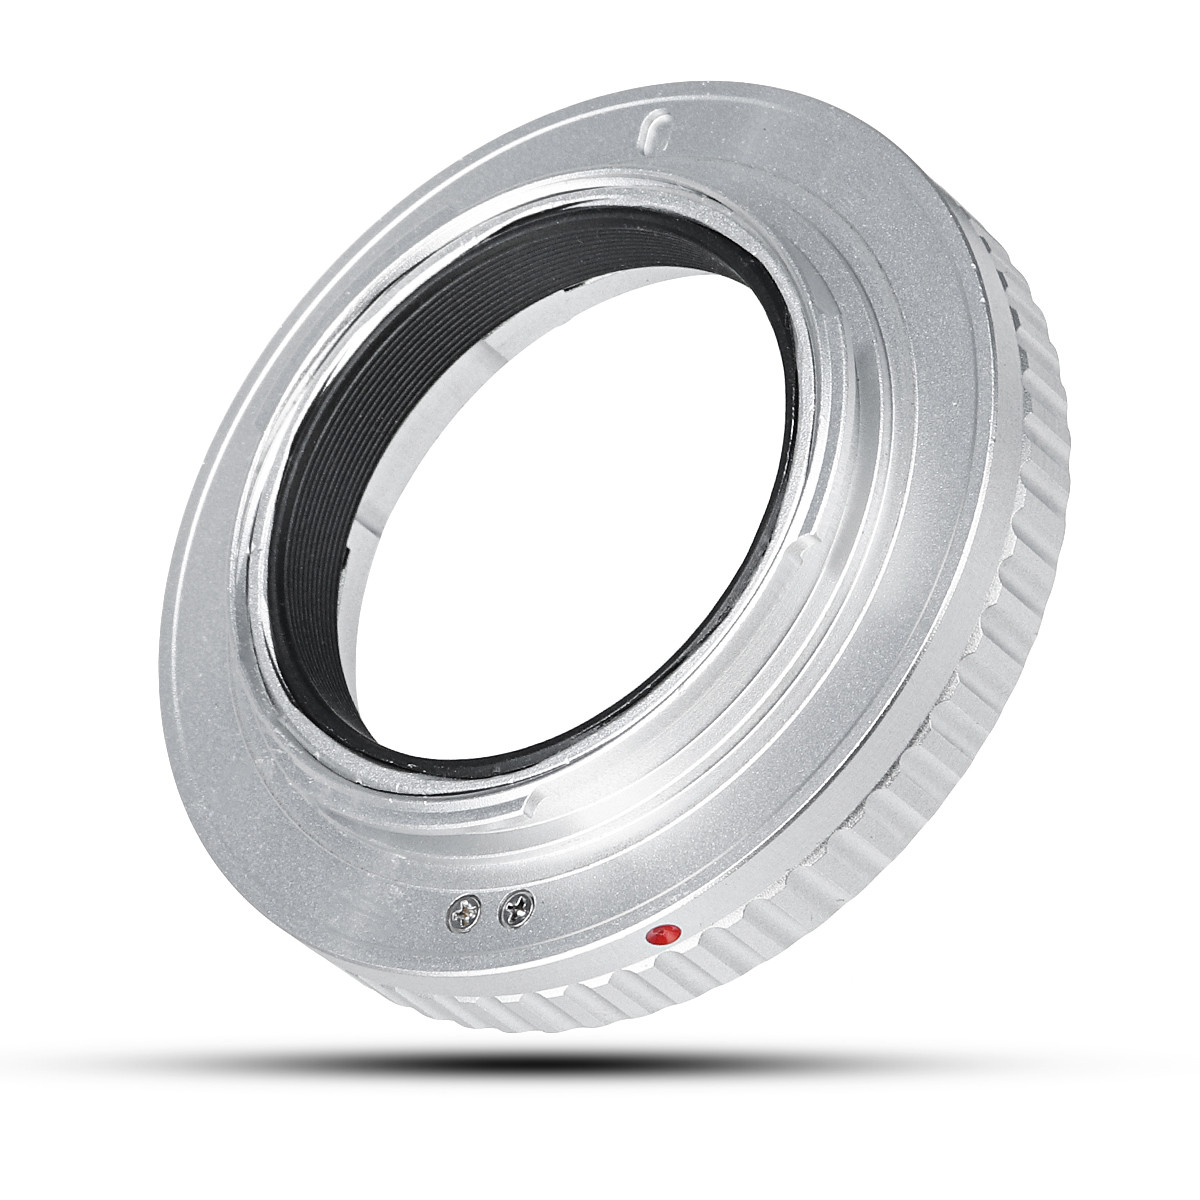 LM-NEX Close Focus Adapter камера Кольцо для Leica M Объектив Для Sony E Mount Macro-1TopShop